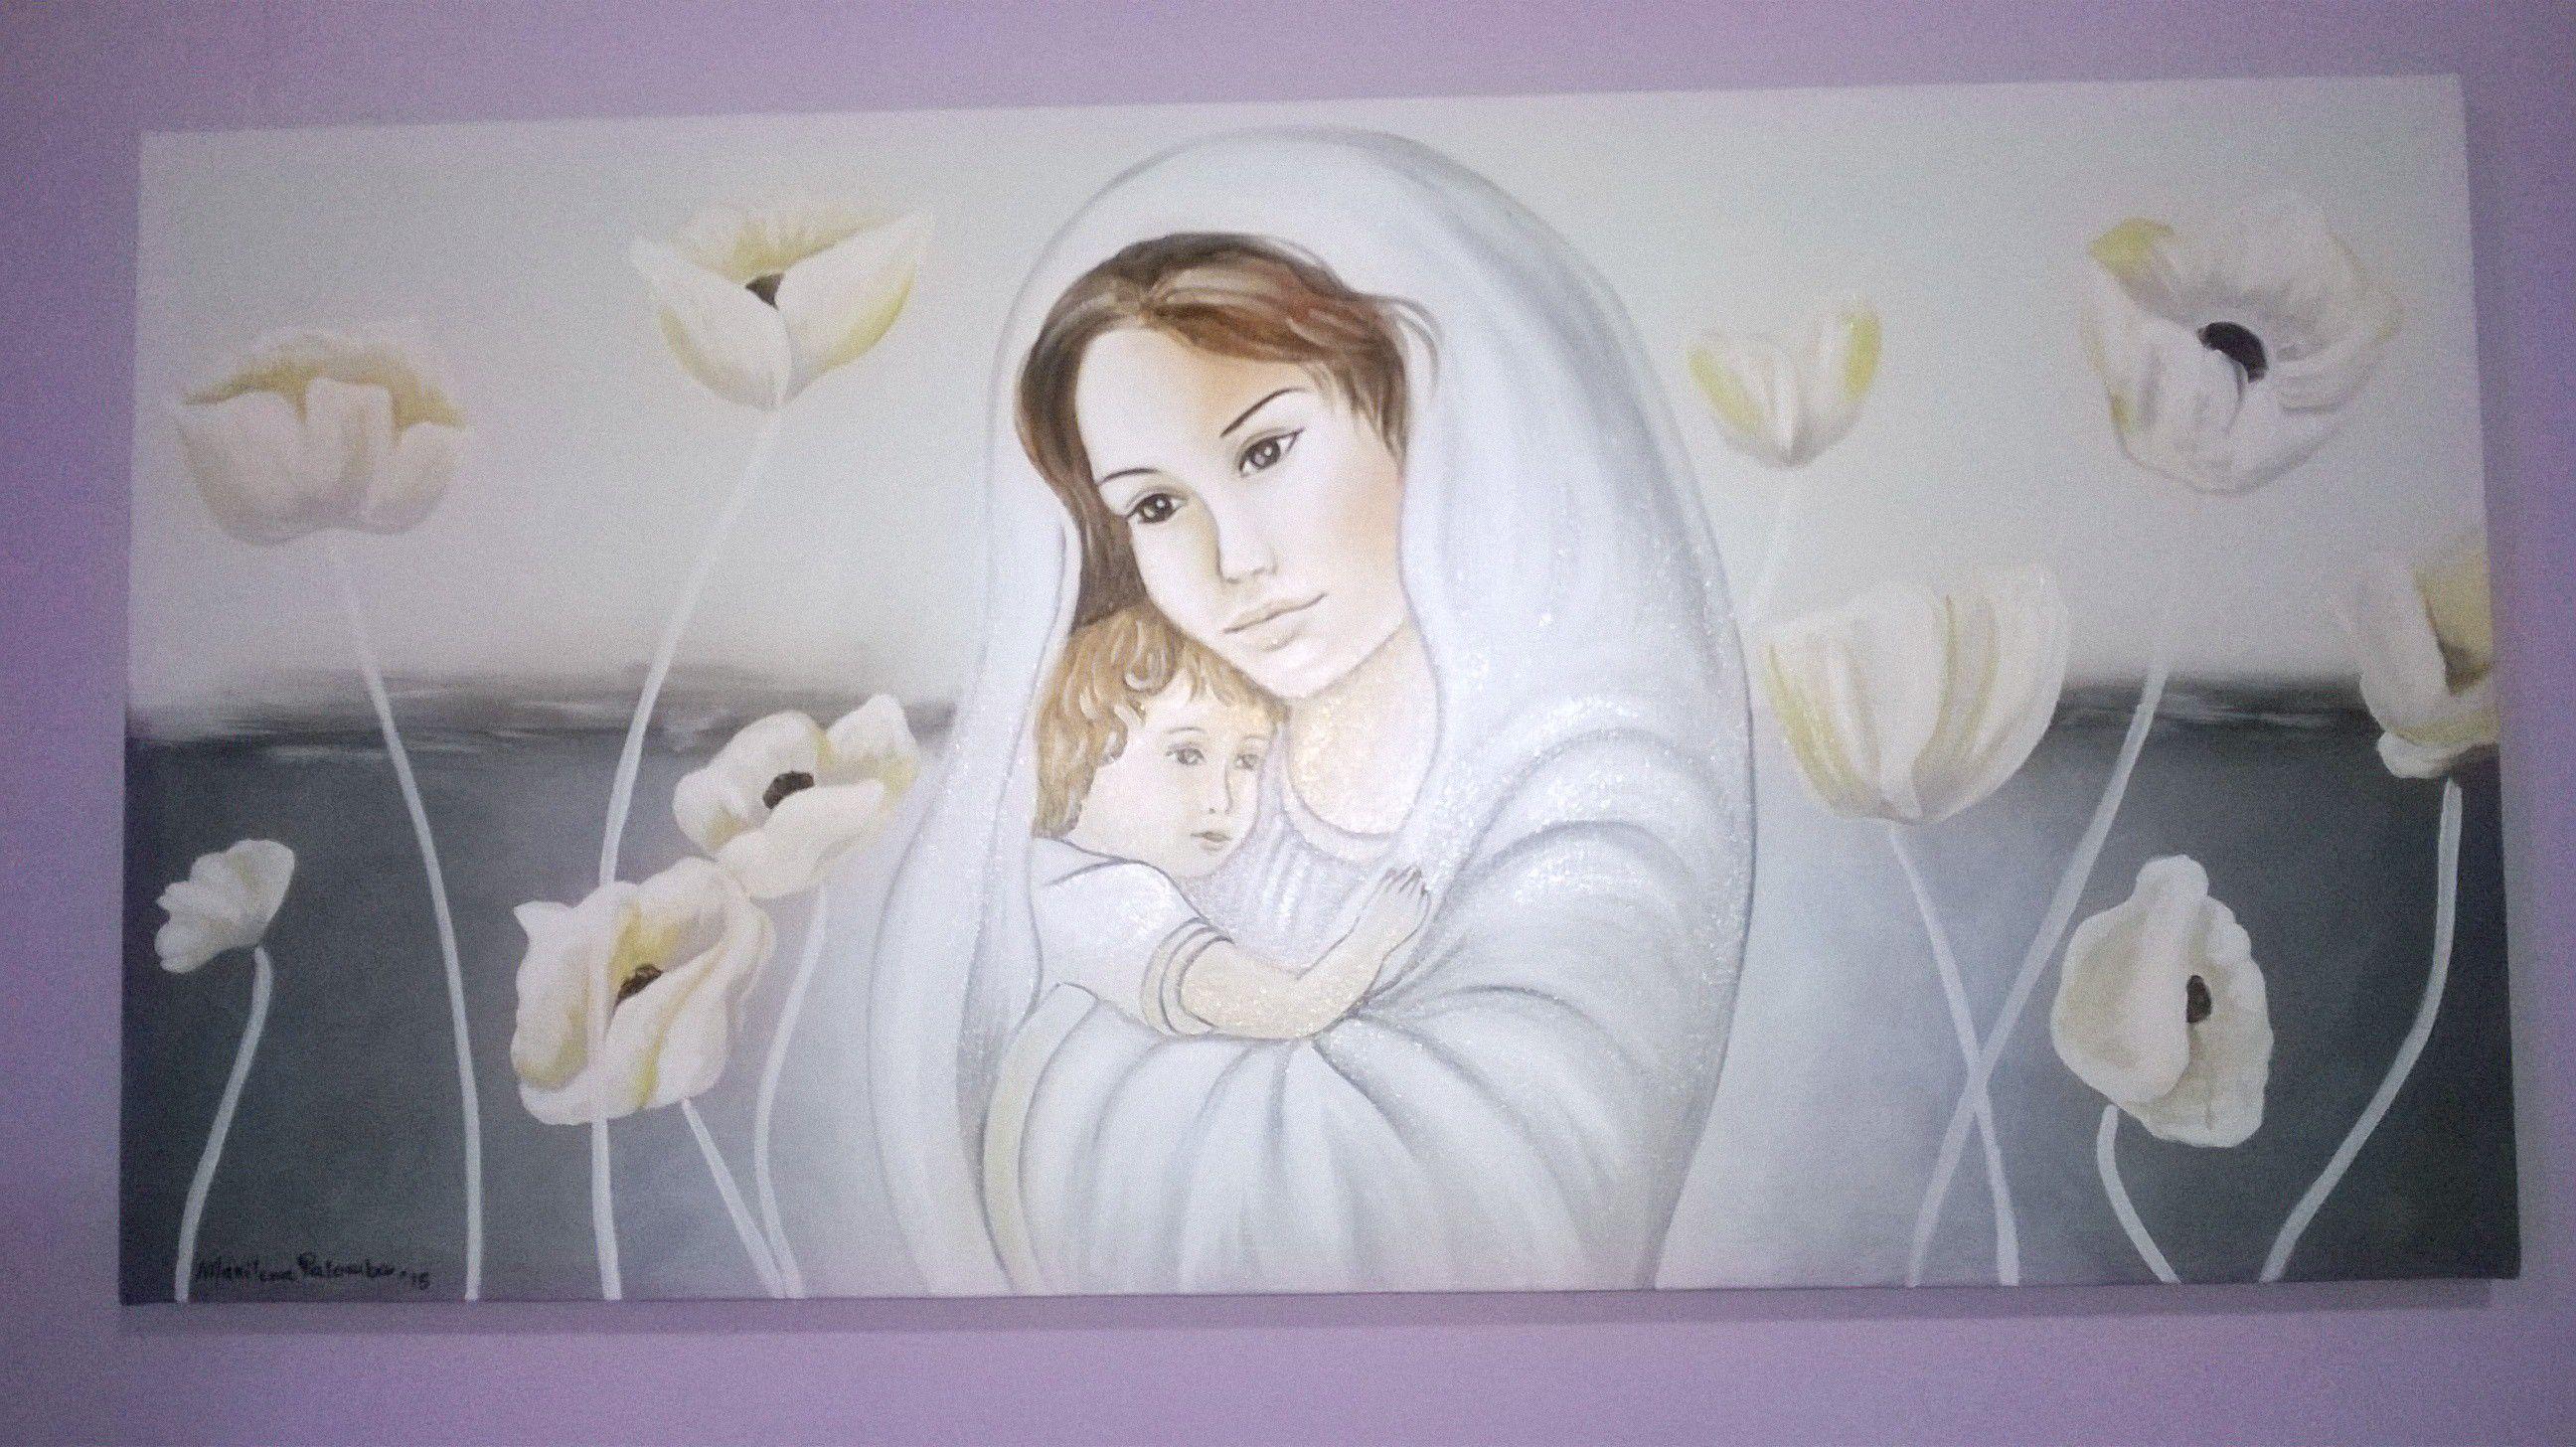 Capoletto Dipinto a mano,olio su tela, madonna con bambino, 40x80 cm